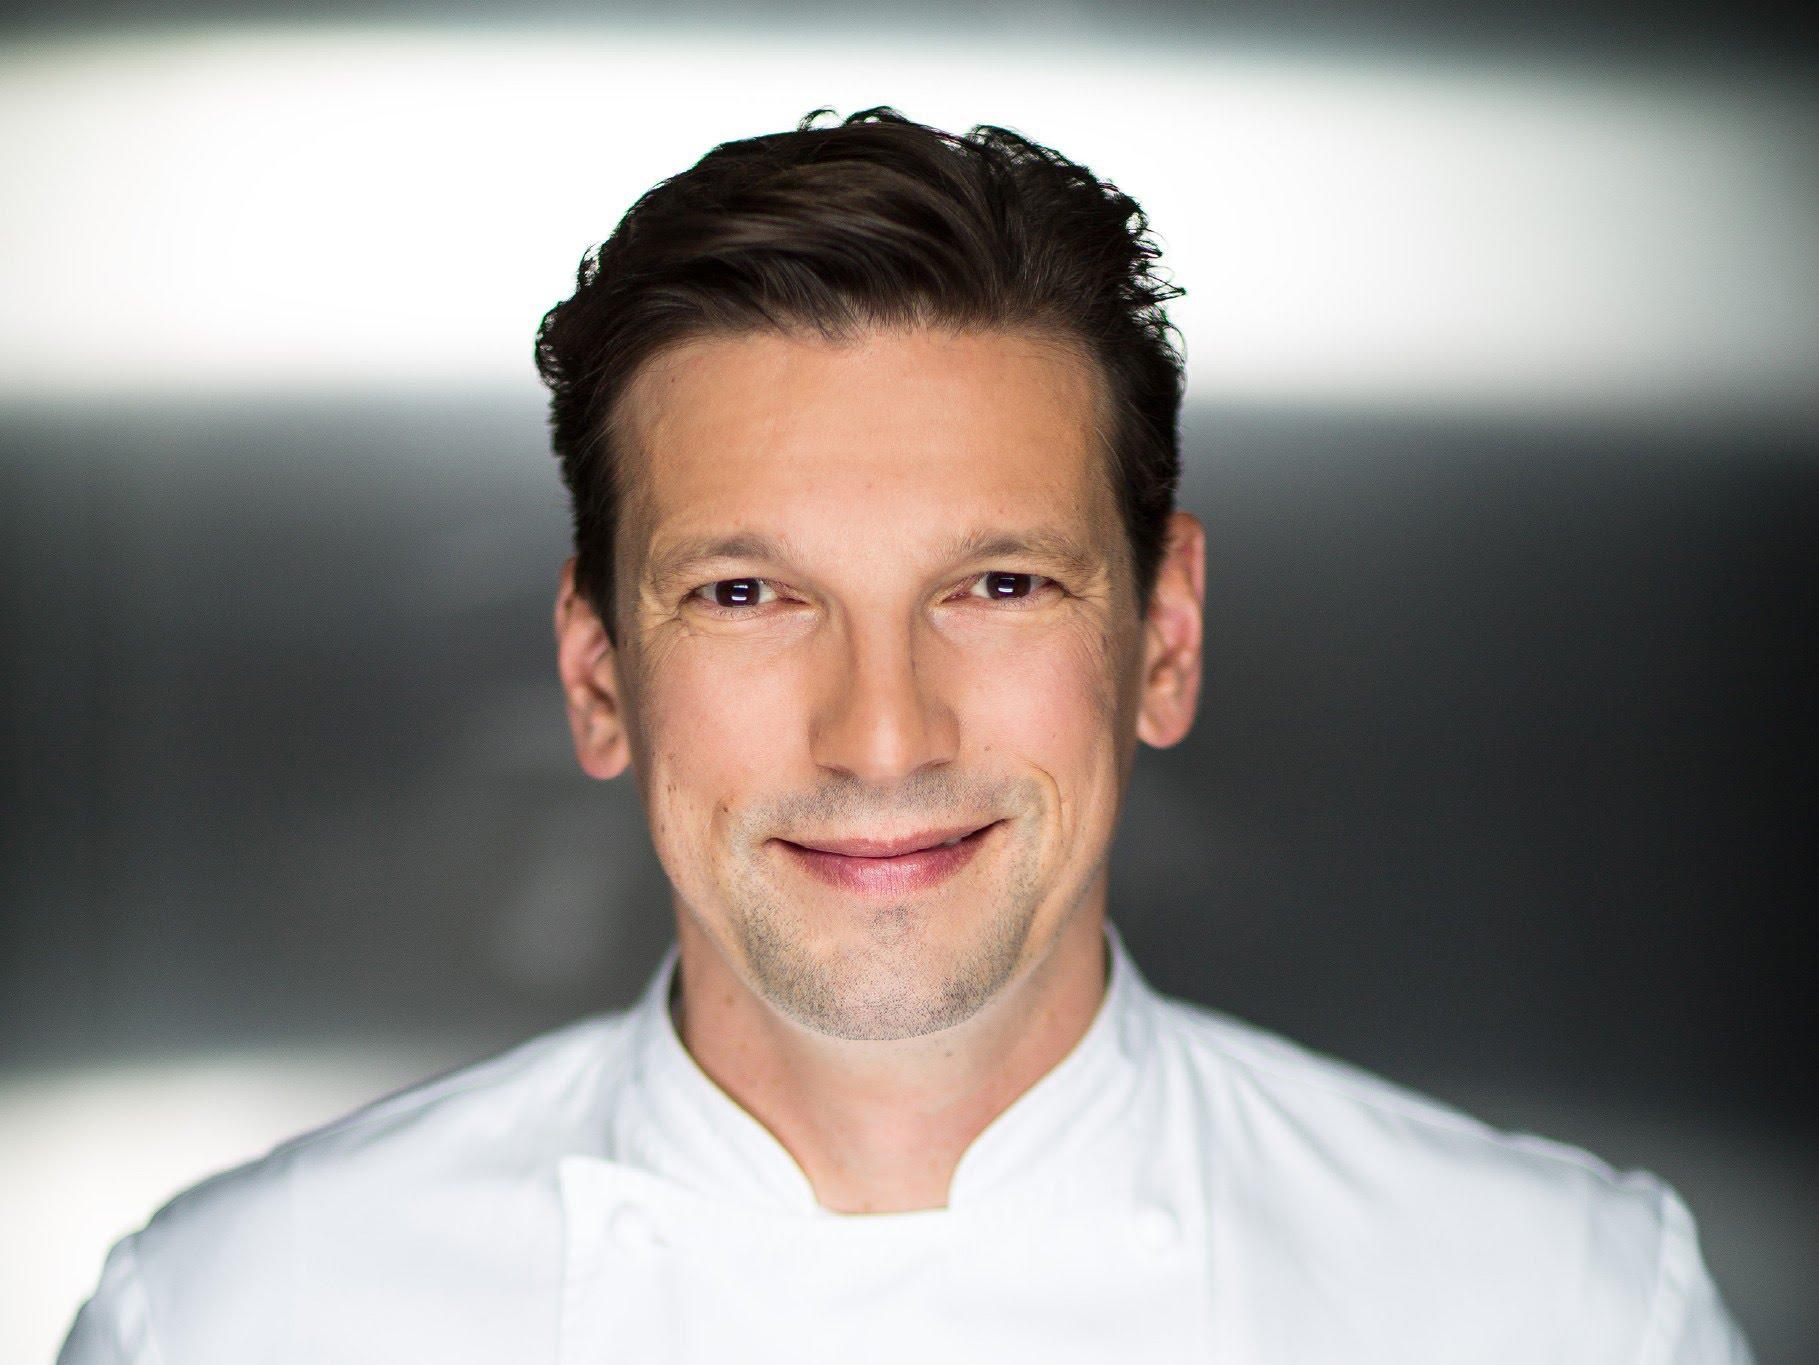 Christian Jurgens